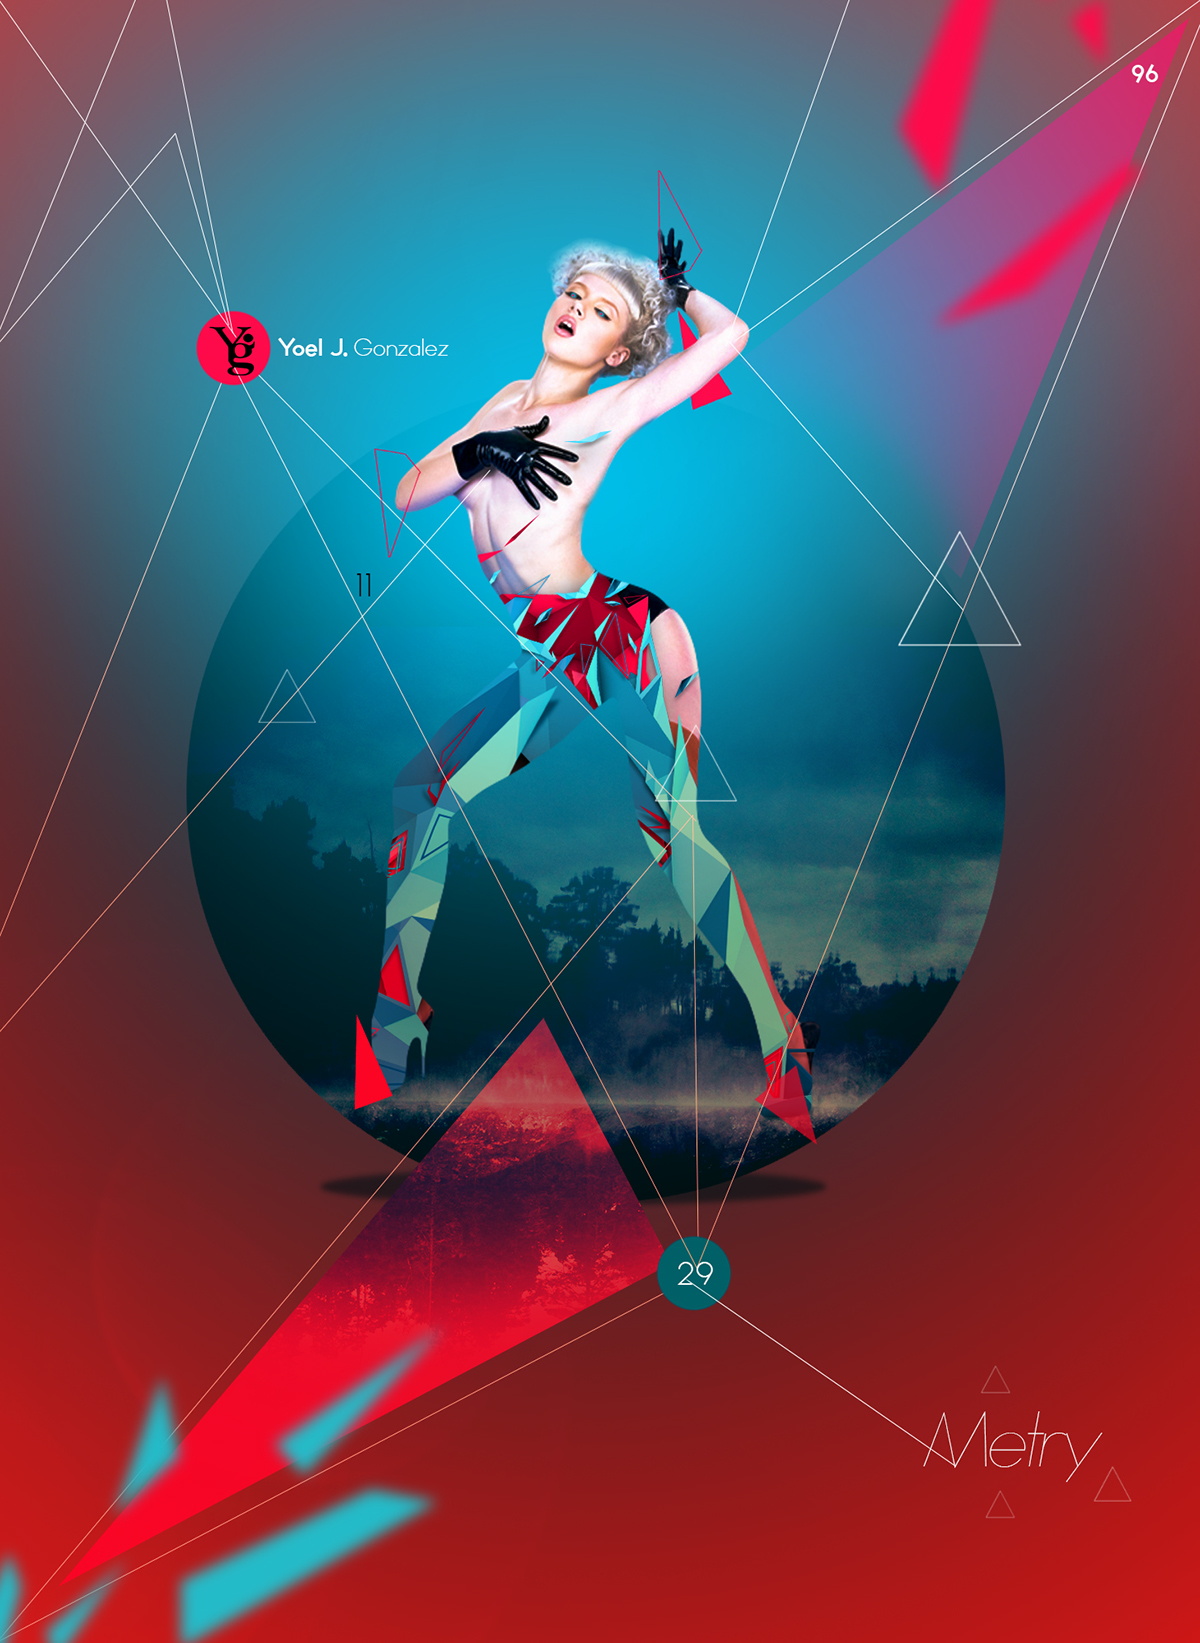 Poster 006 - Yoel J Gonzalez.jpg